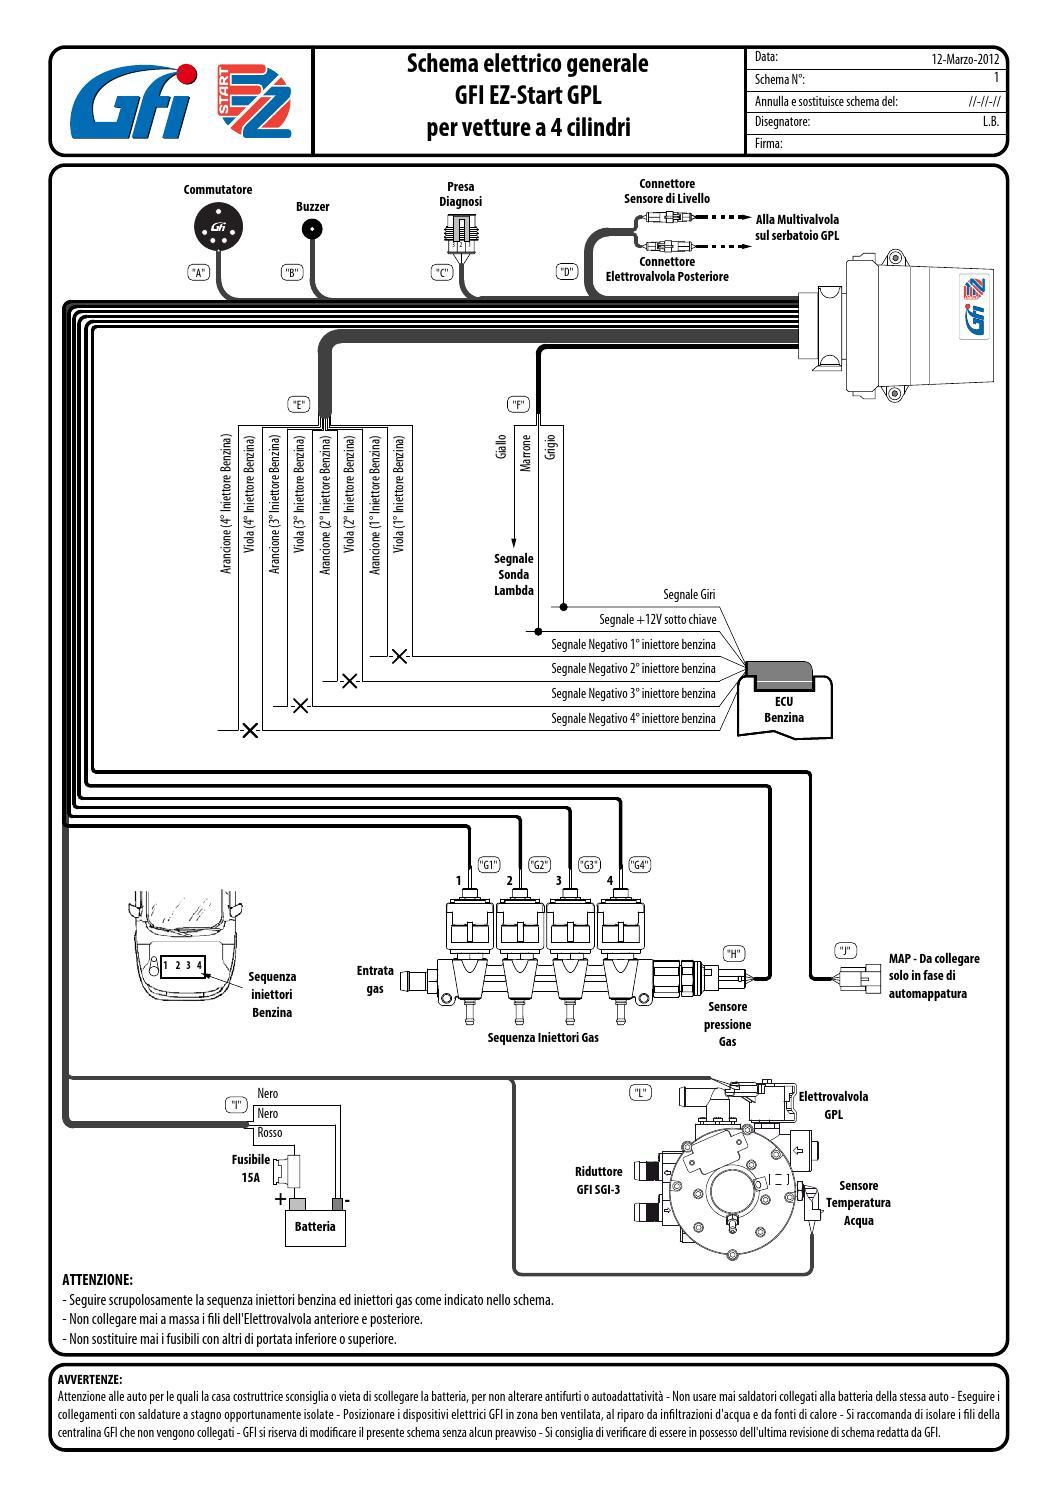 Schema Elettrico Per Xing : Esquema electrico gfi ez start gpl cil by convertec issuu